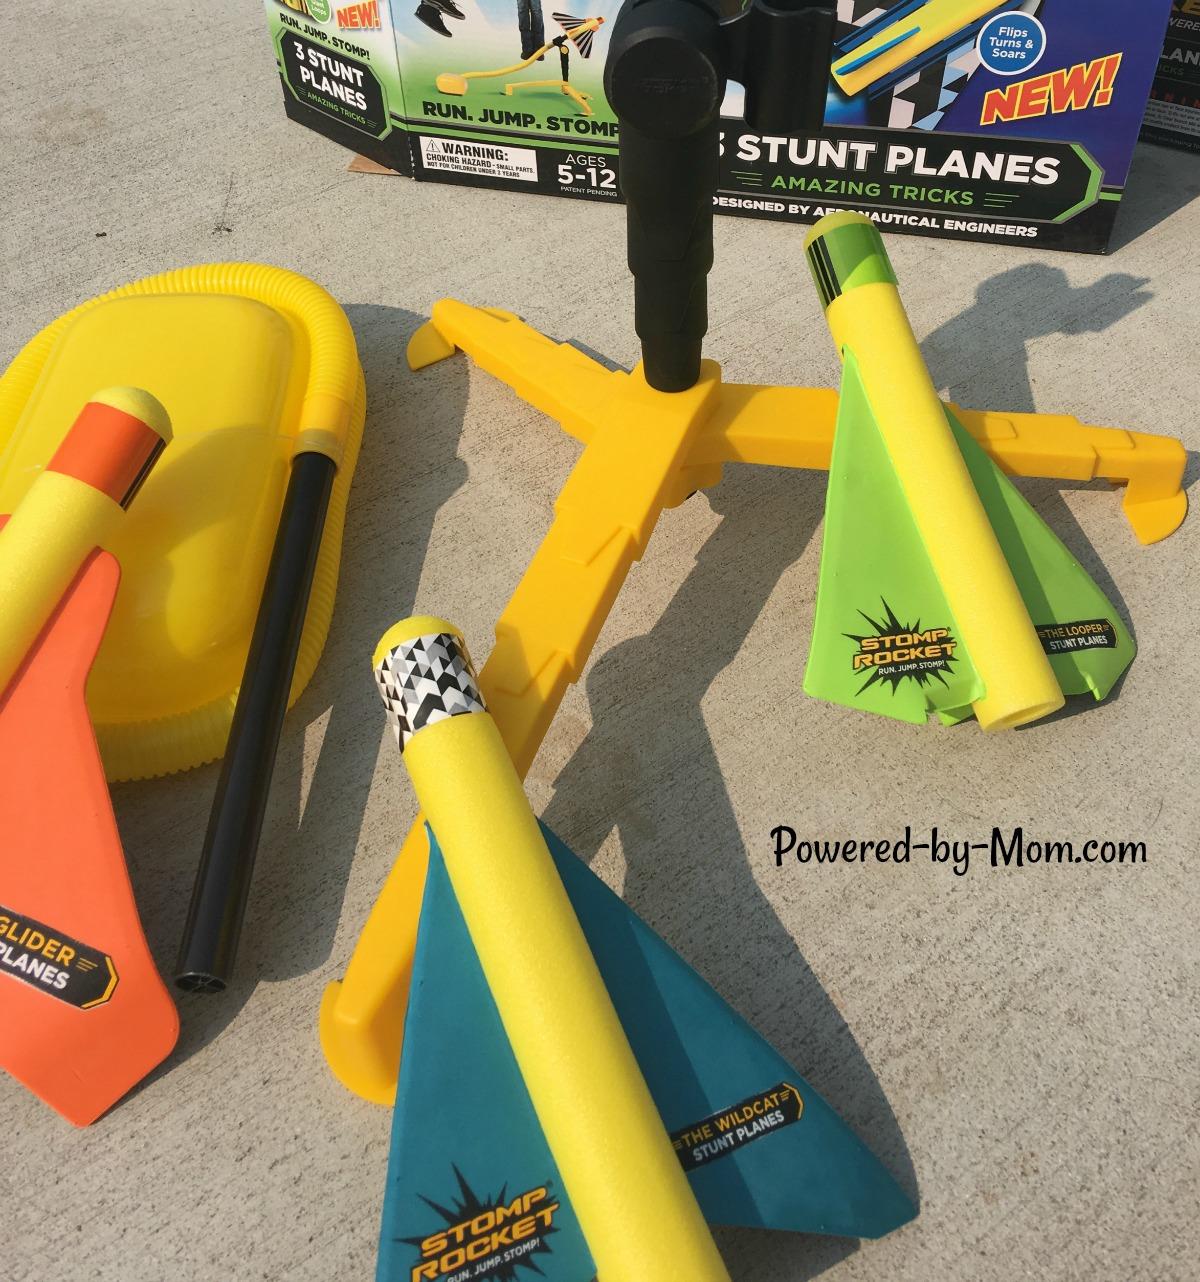 Stomp Rocket Stunt Plane - Powered by Mom